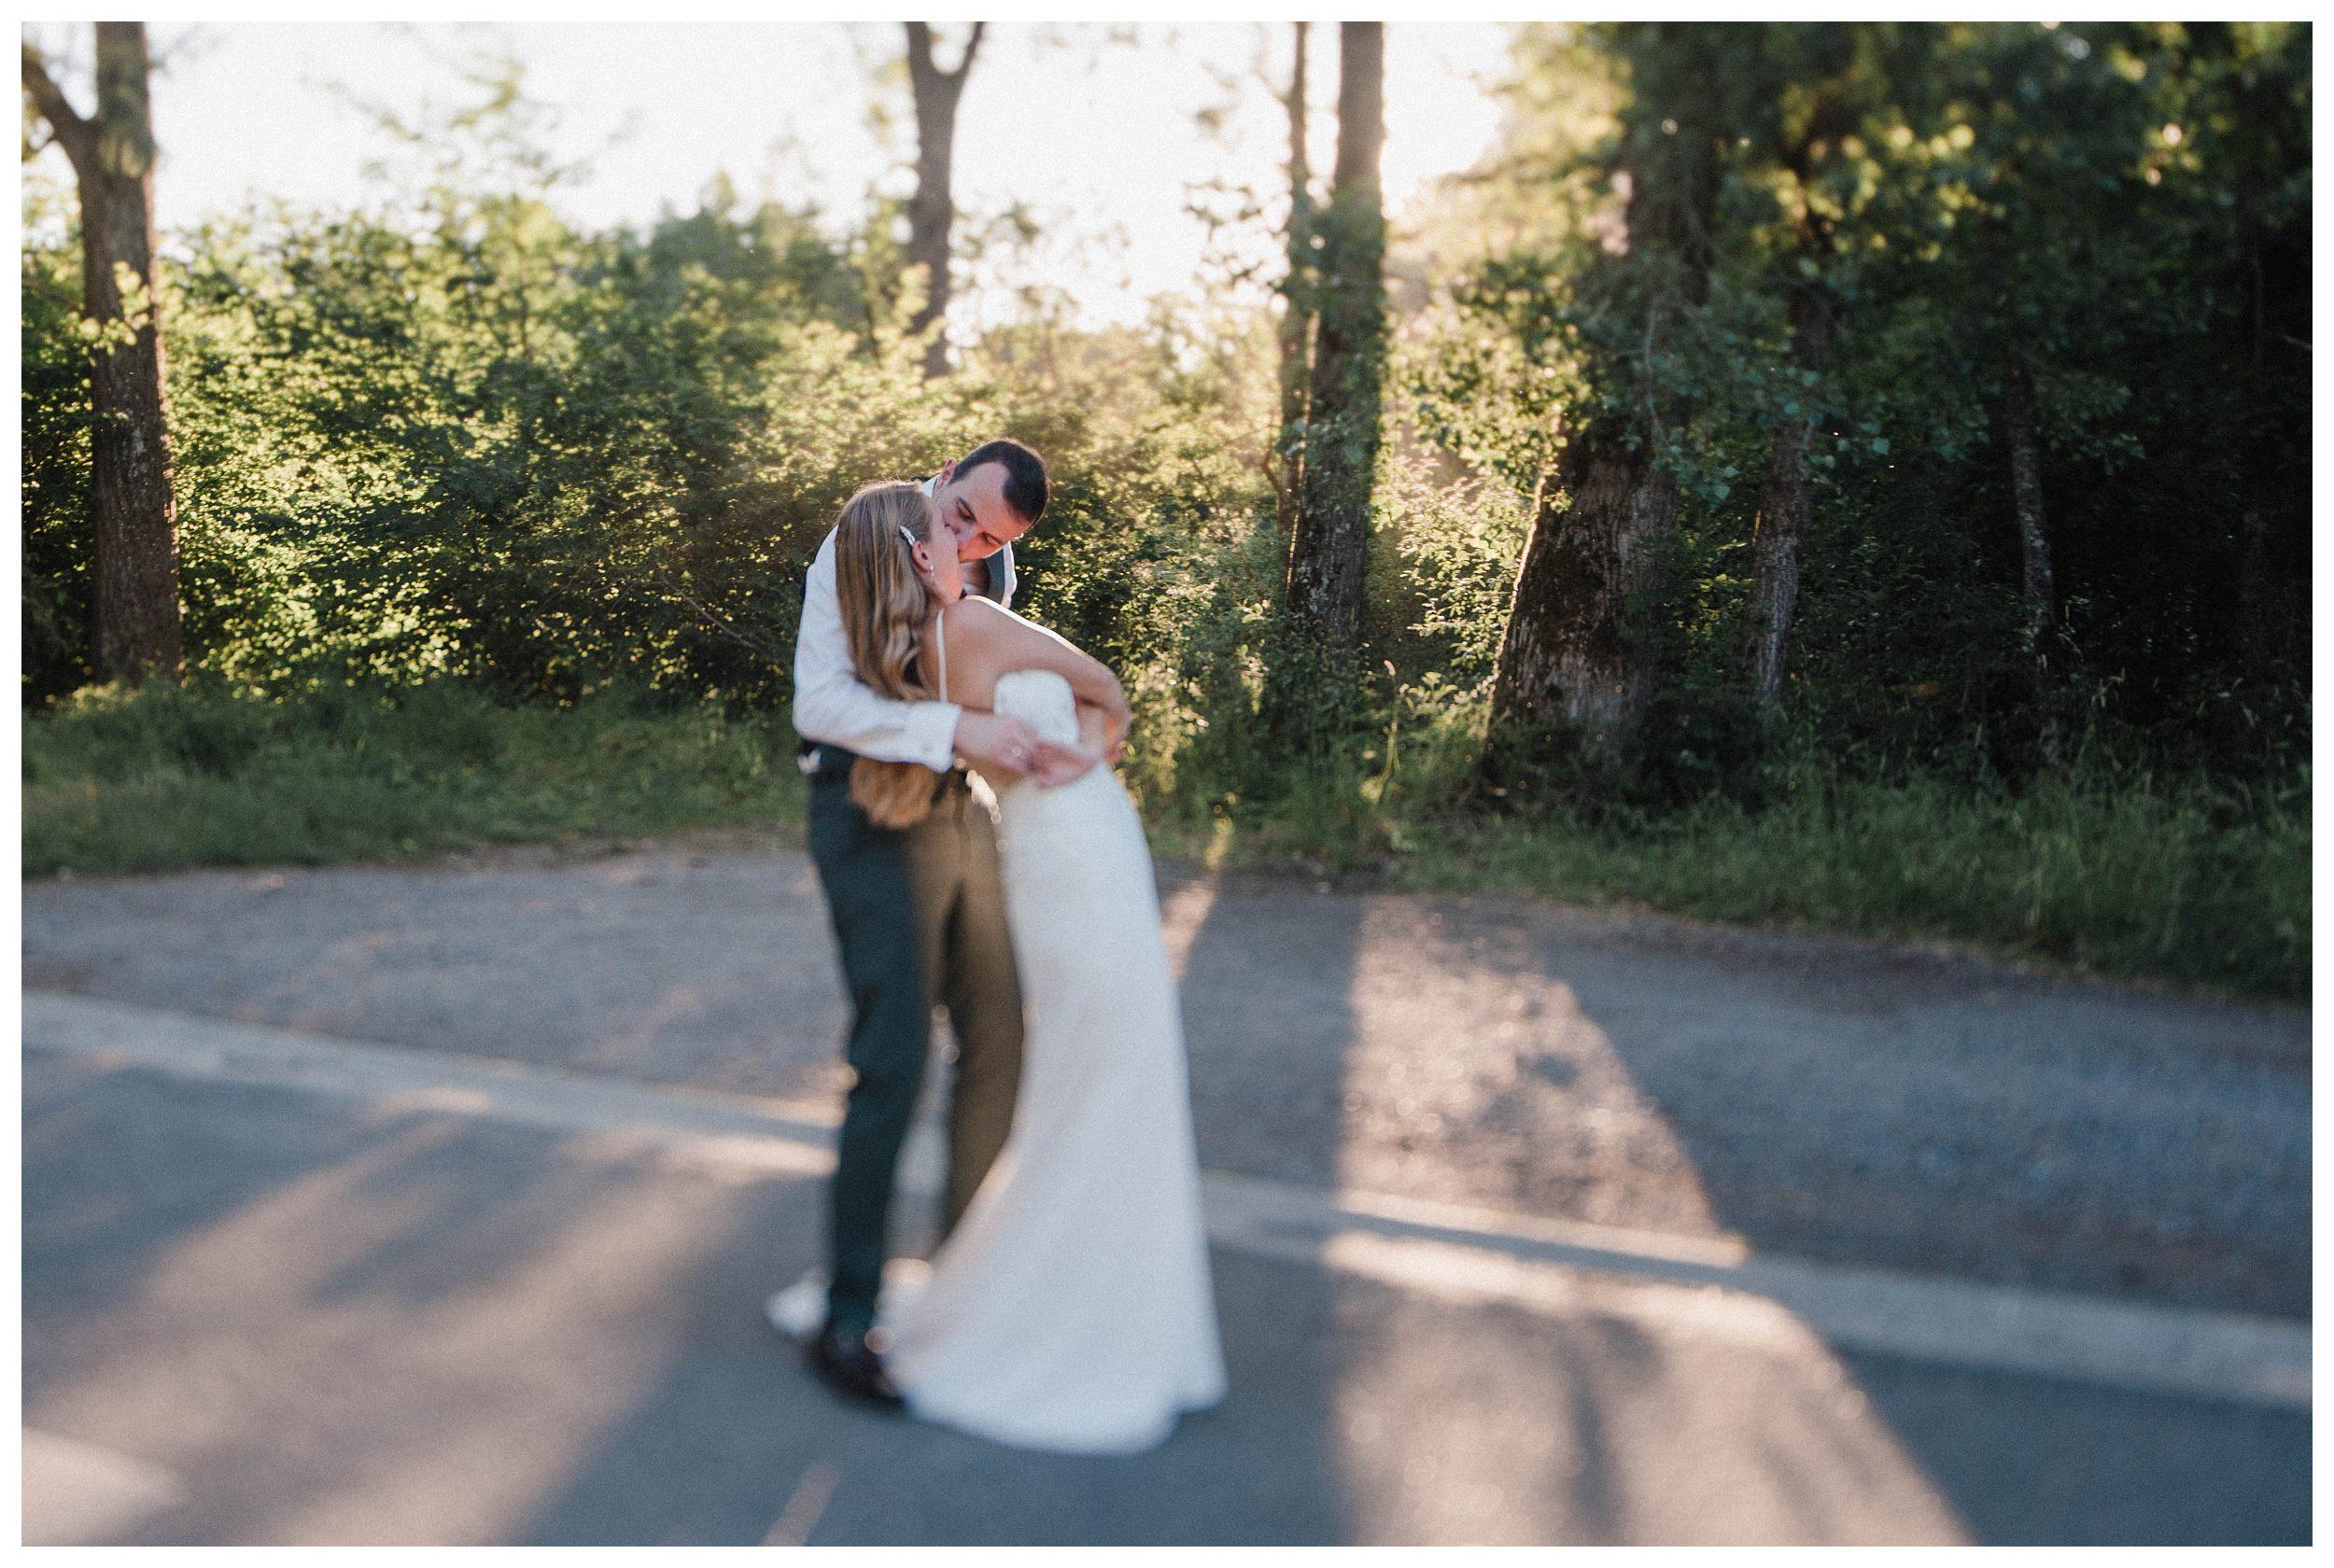 huwelijksfotograaf bruidsfotograaf destinationwedding huwelijksfotografie in ardennen nederland (89).jpg